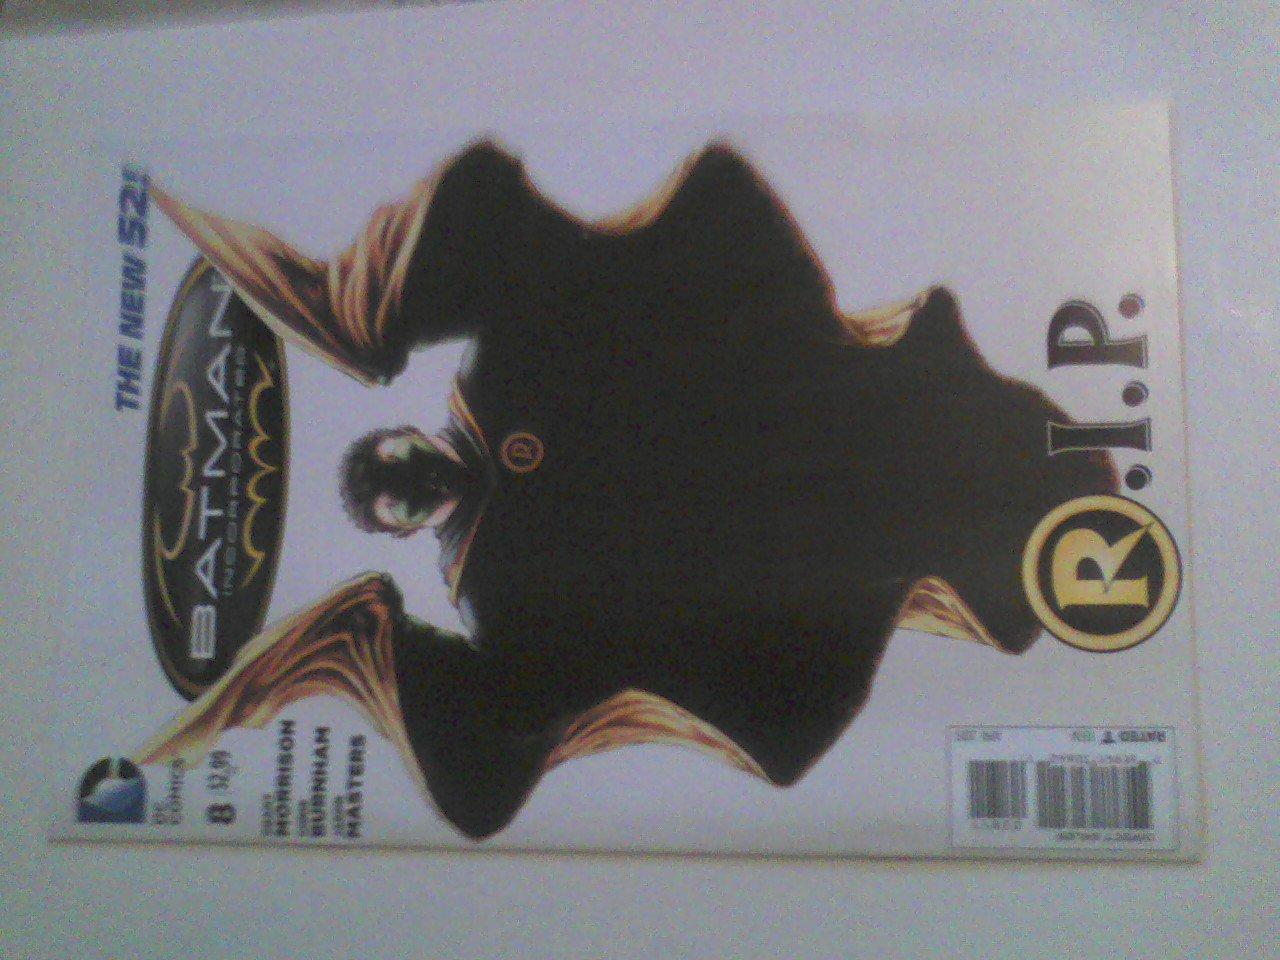 Damian Wayne's Death/Requiem Batman #18 Batman Incorporated #8